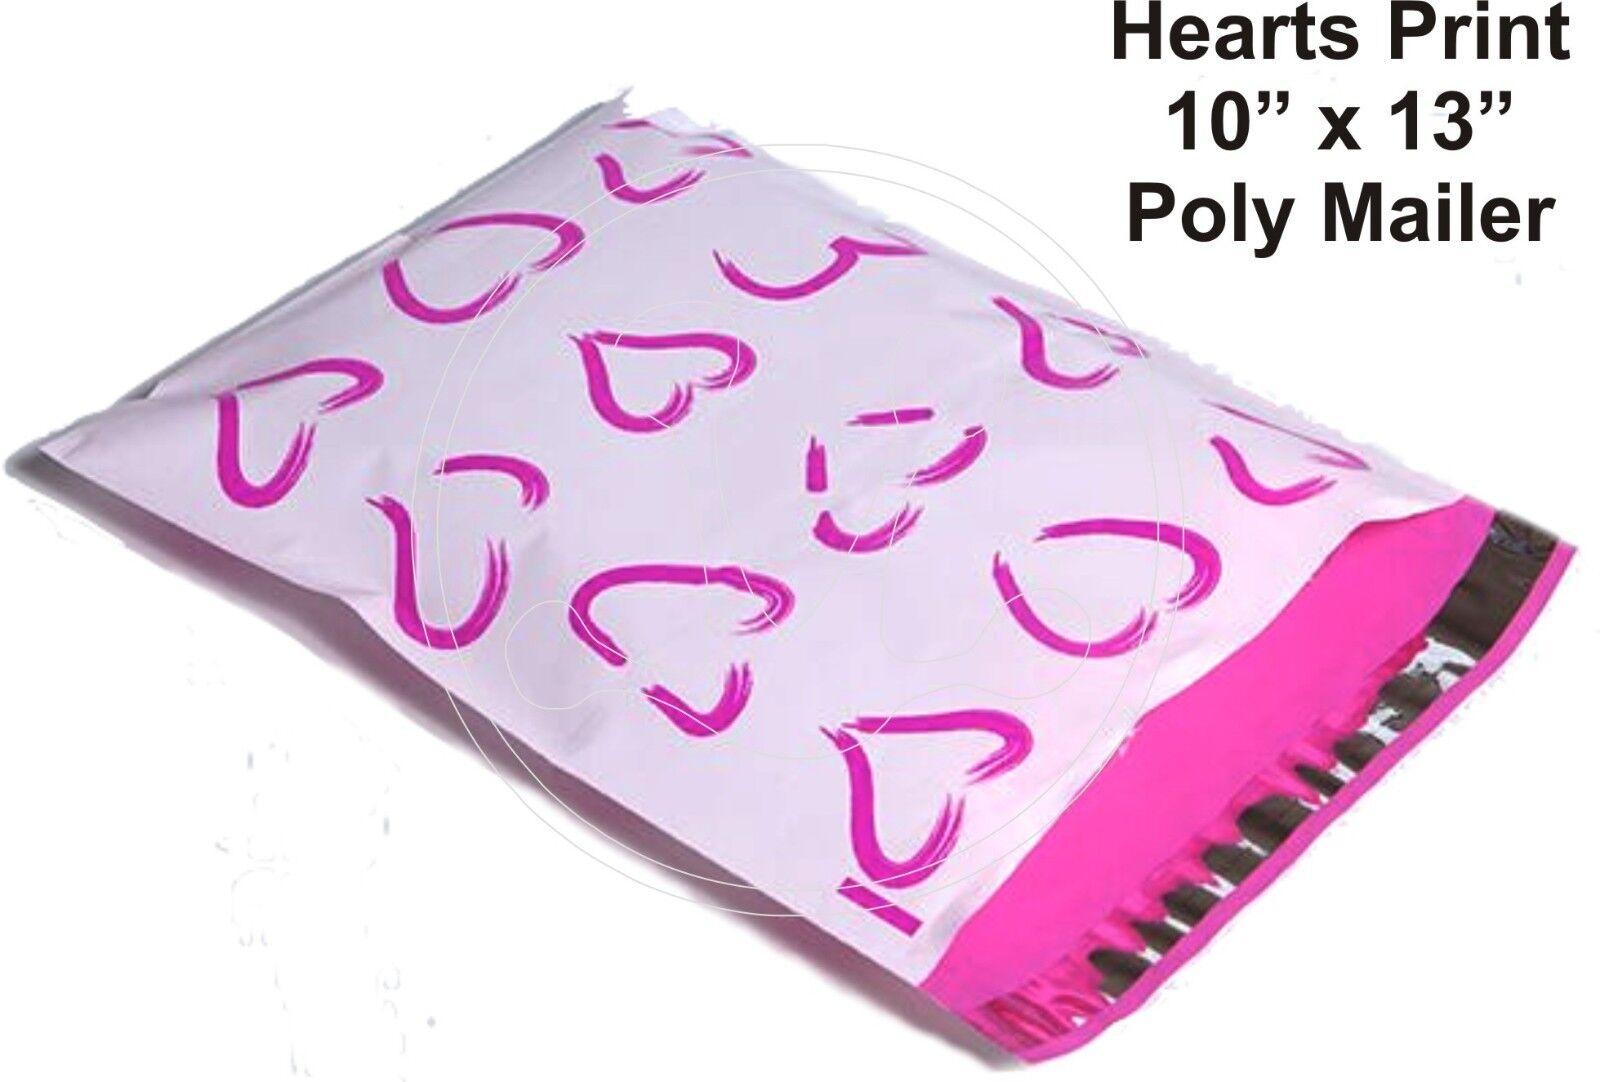 (35) PINK HEARTS Print 10 x 13 Poly Mailers Self Sealing Envelopes Bags Designer